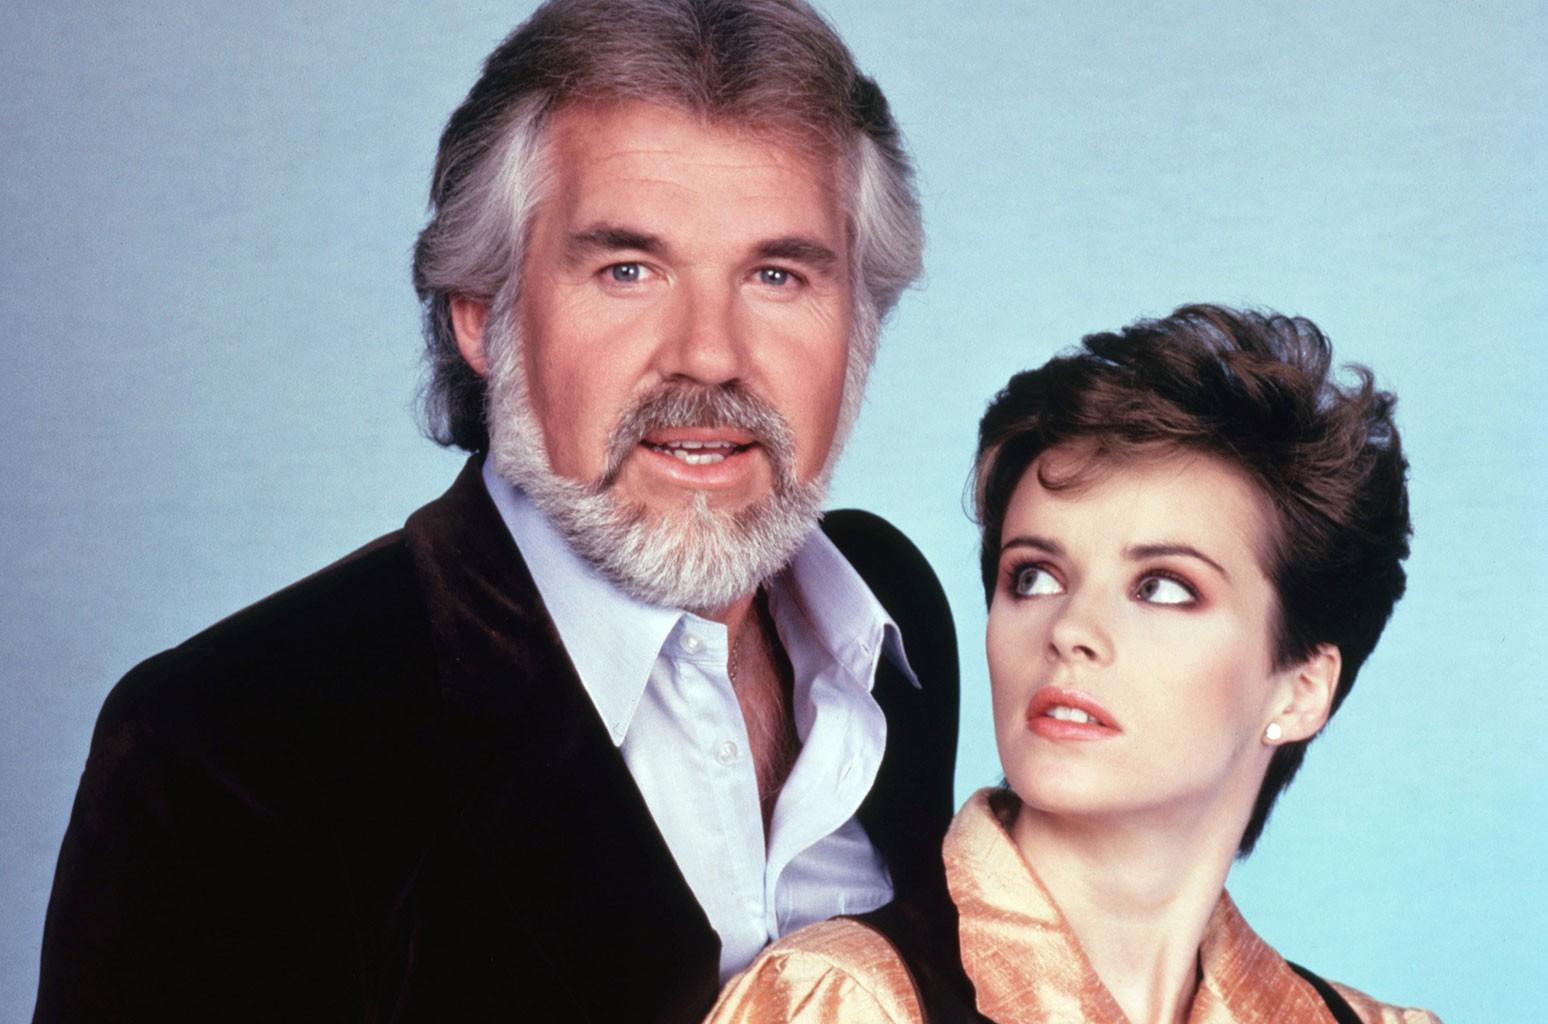 Kenny Rogers and Sheena Easton